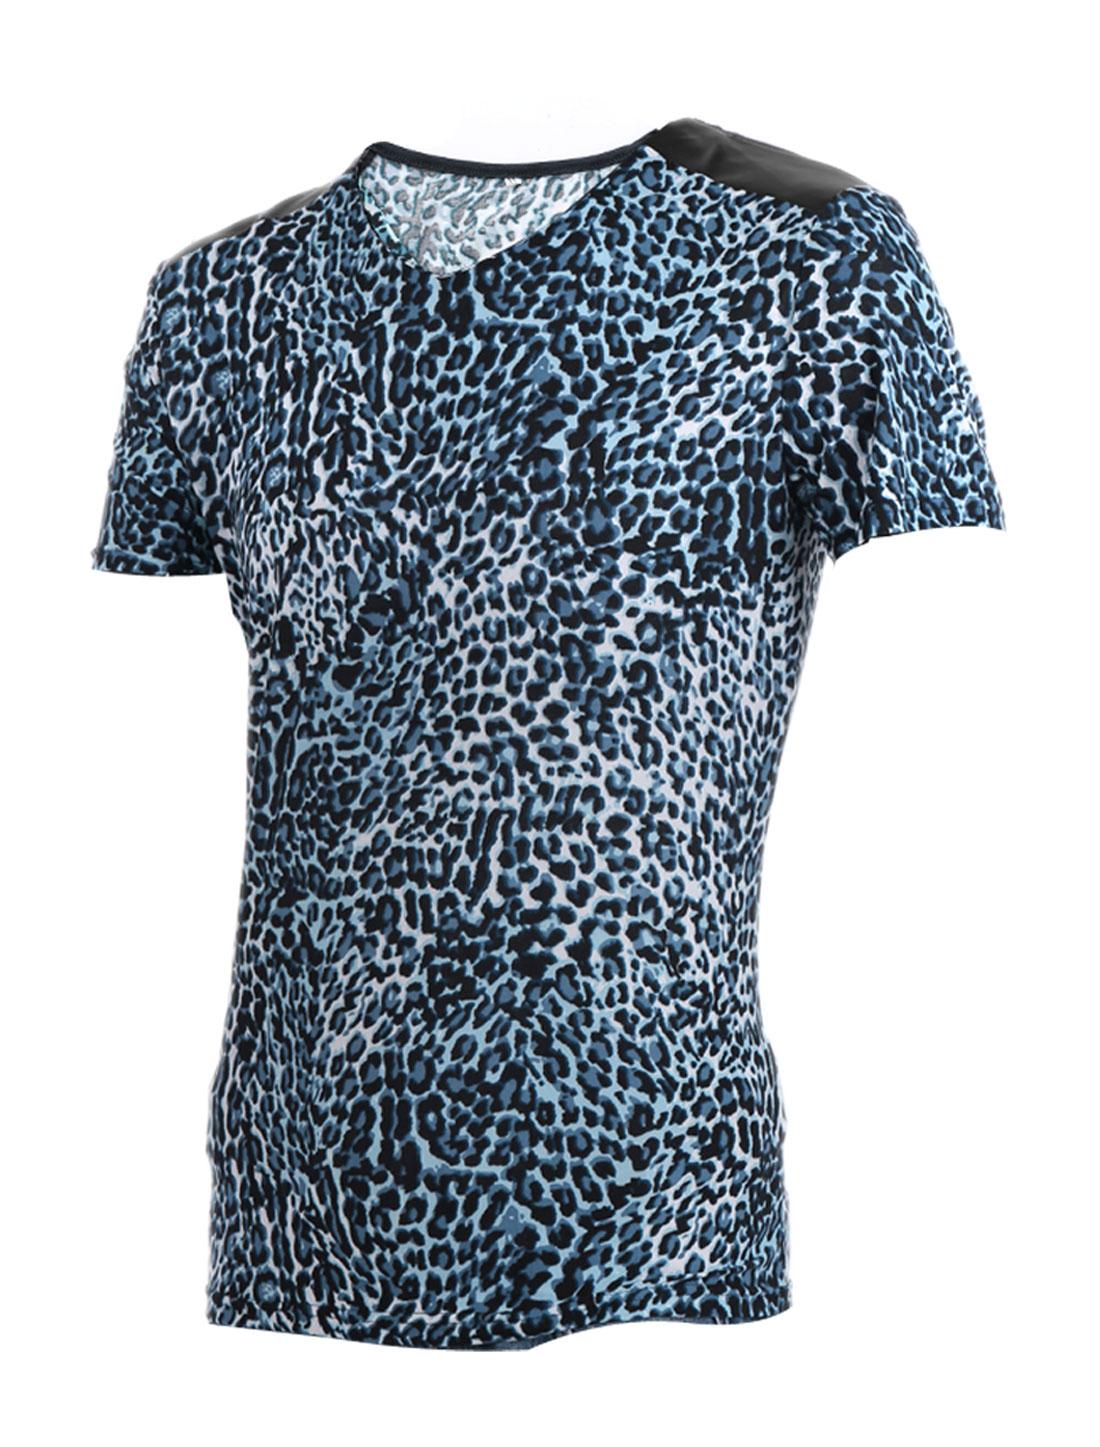 Men Blue Black V Neckline Short Sleeve Leopard Printed Summer Tee Shirt XL